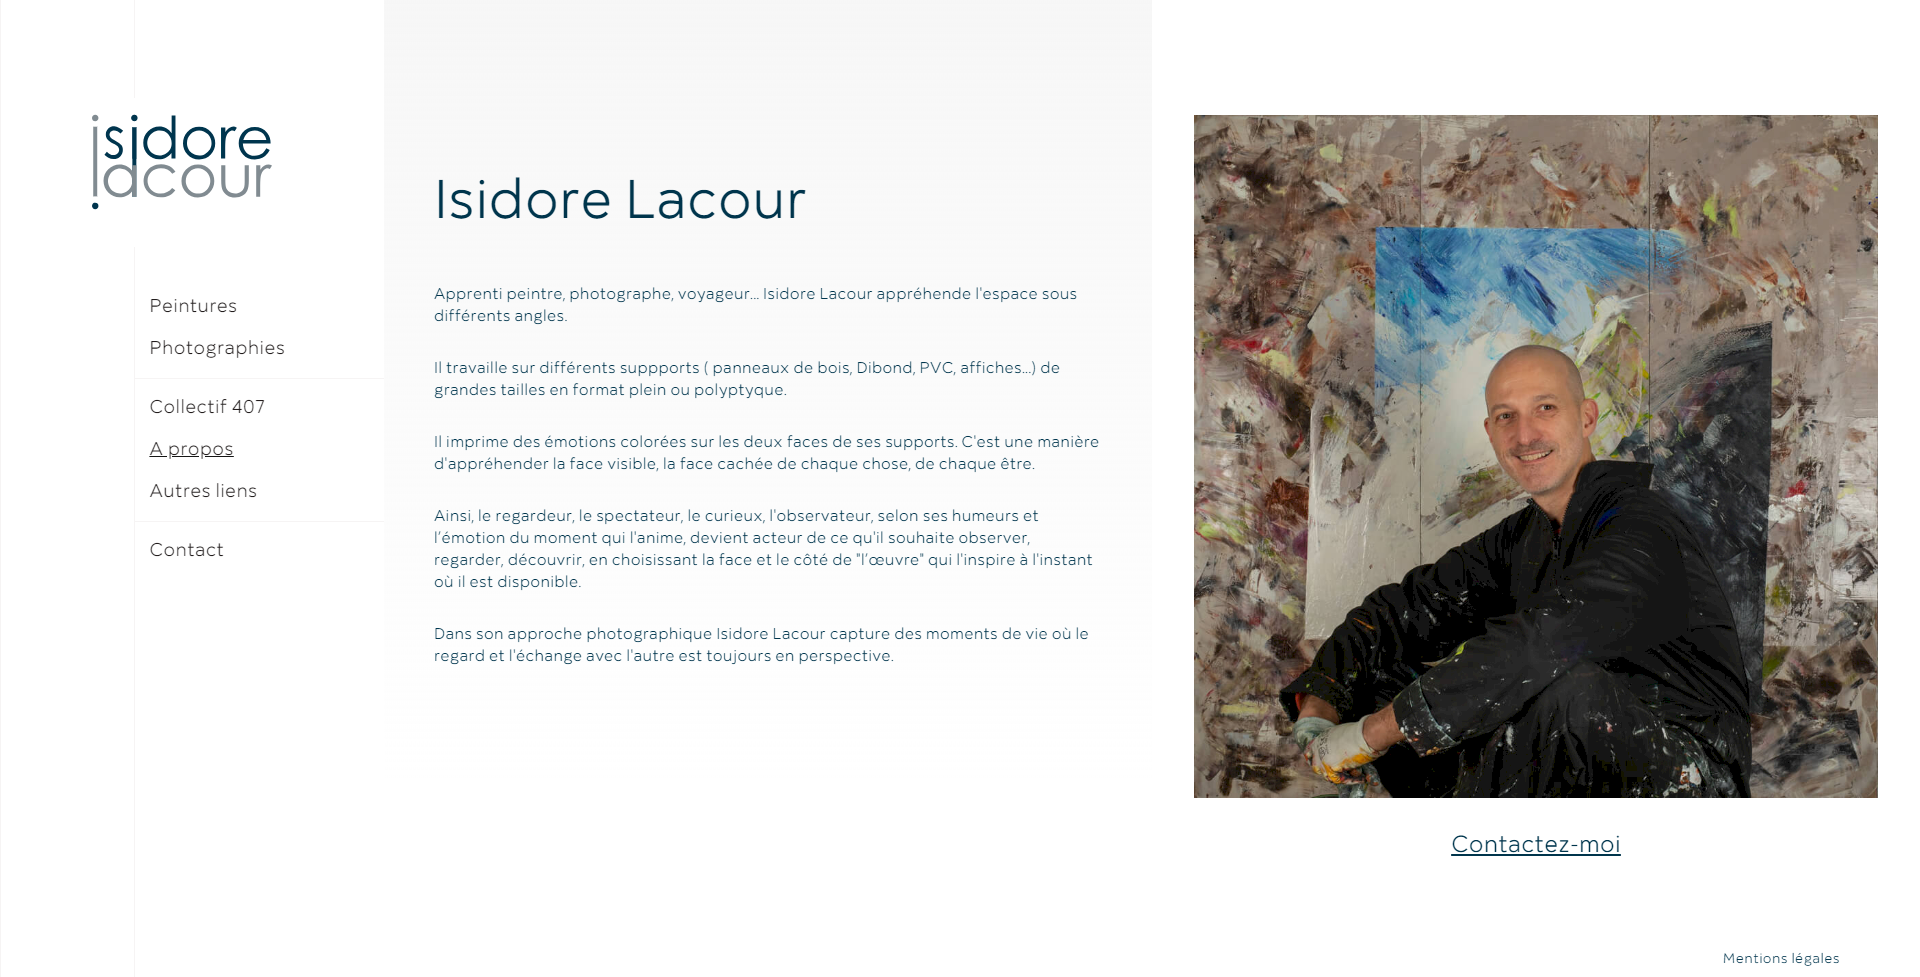 about isidore lacour, kalfeutre webdesigner freelance lyon